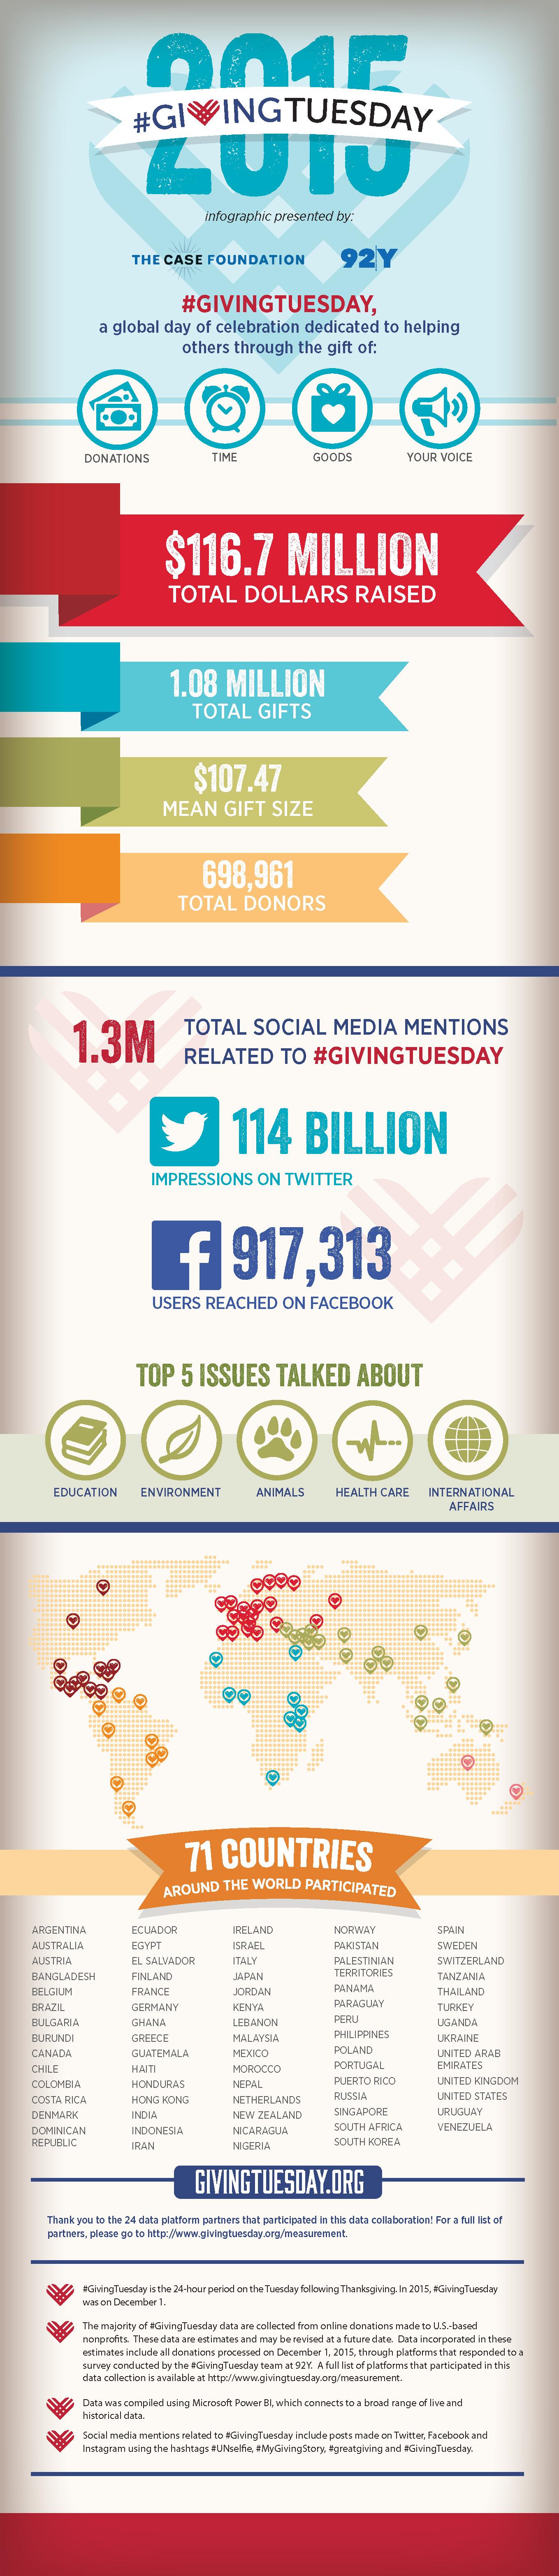 Infographic via givingtuesday.org